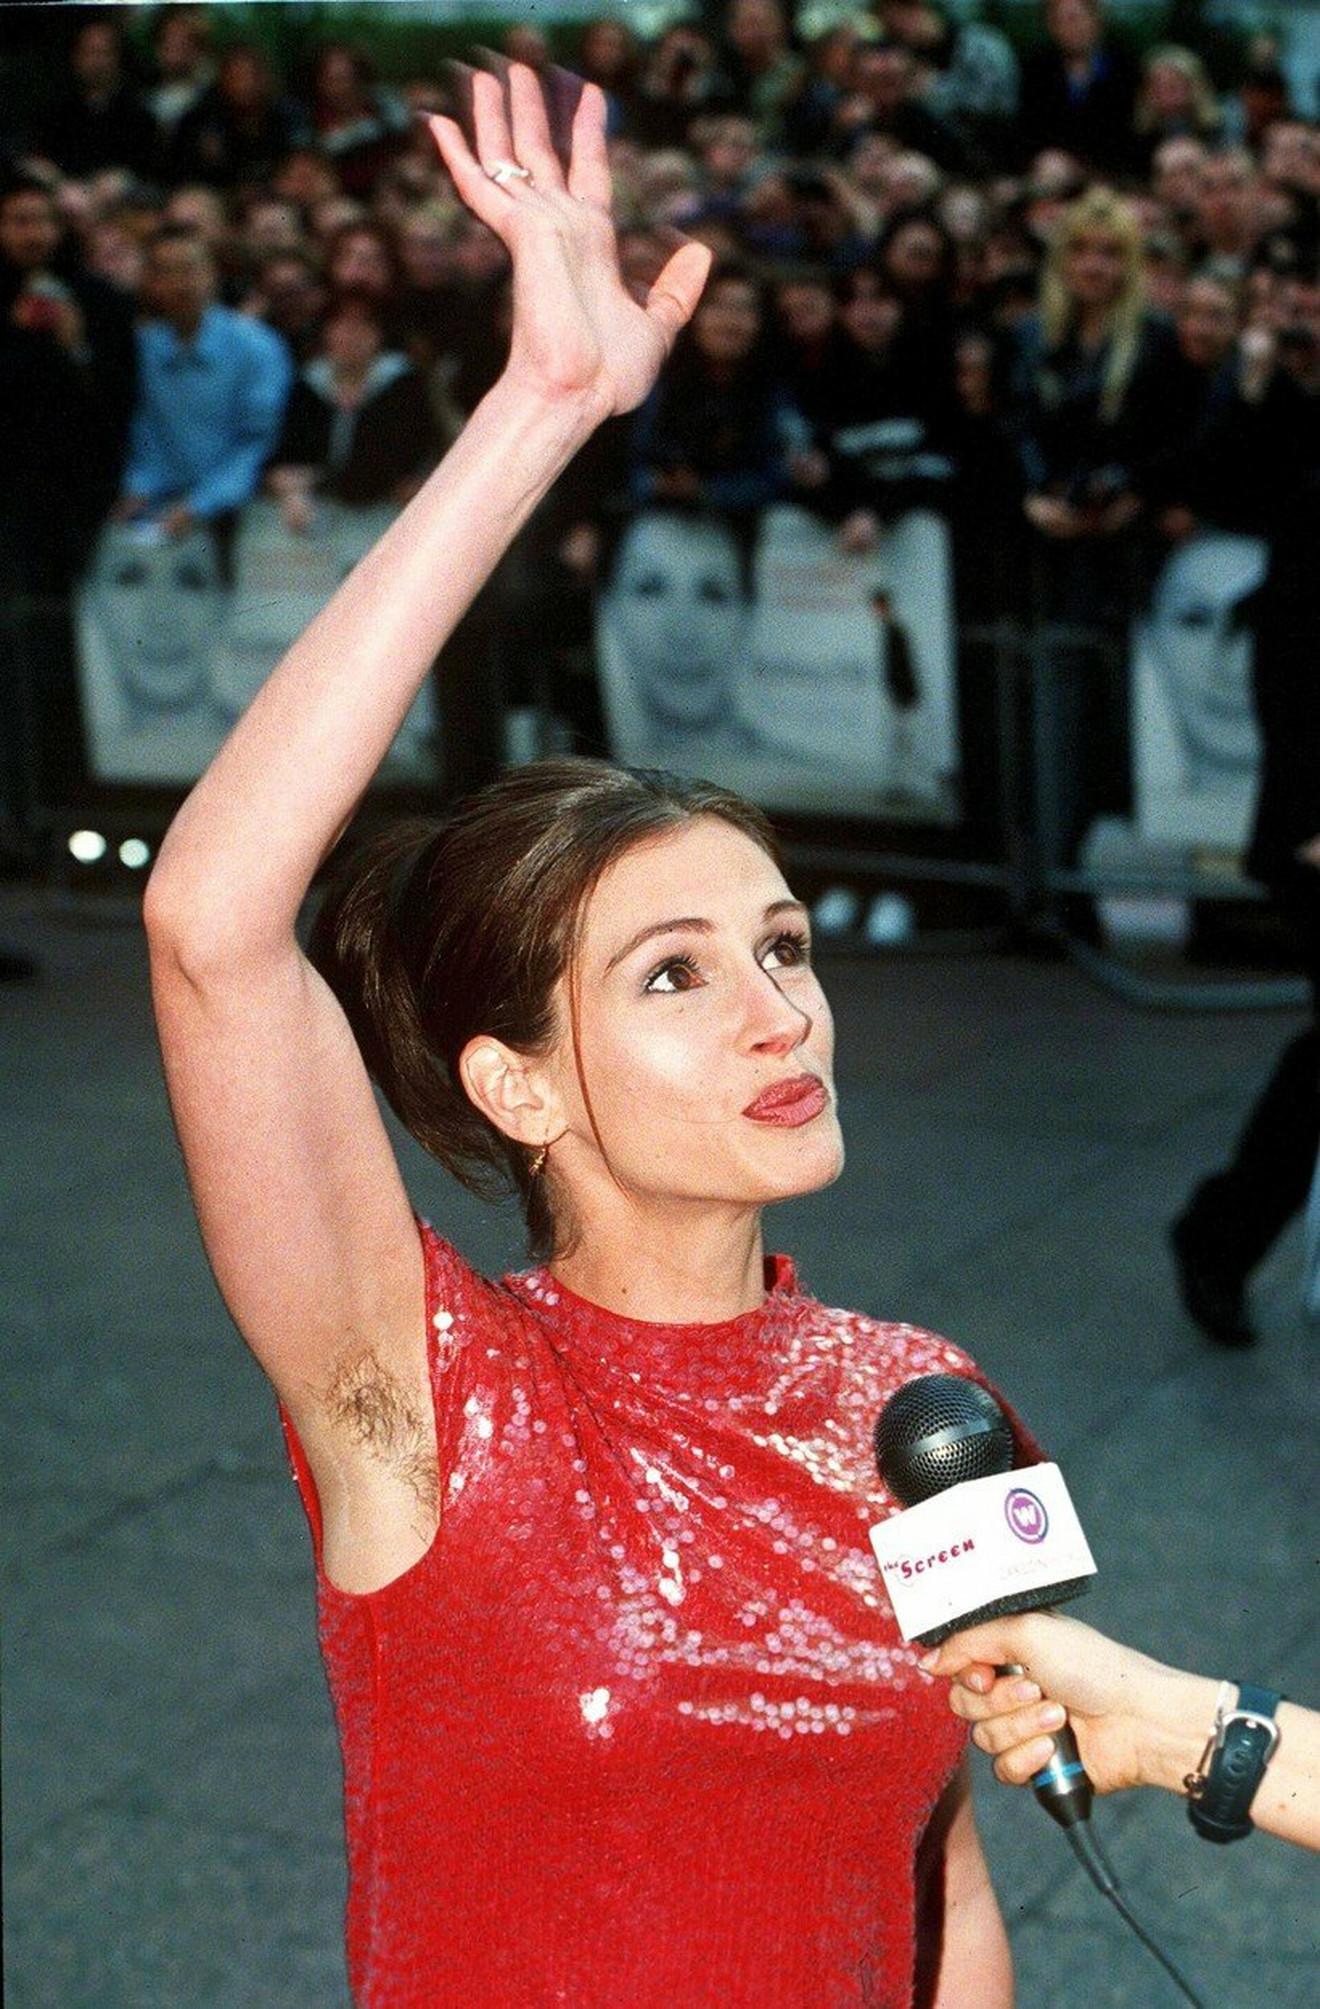 Džulija Roberts 1999. godine na premijere Notting Hill